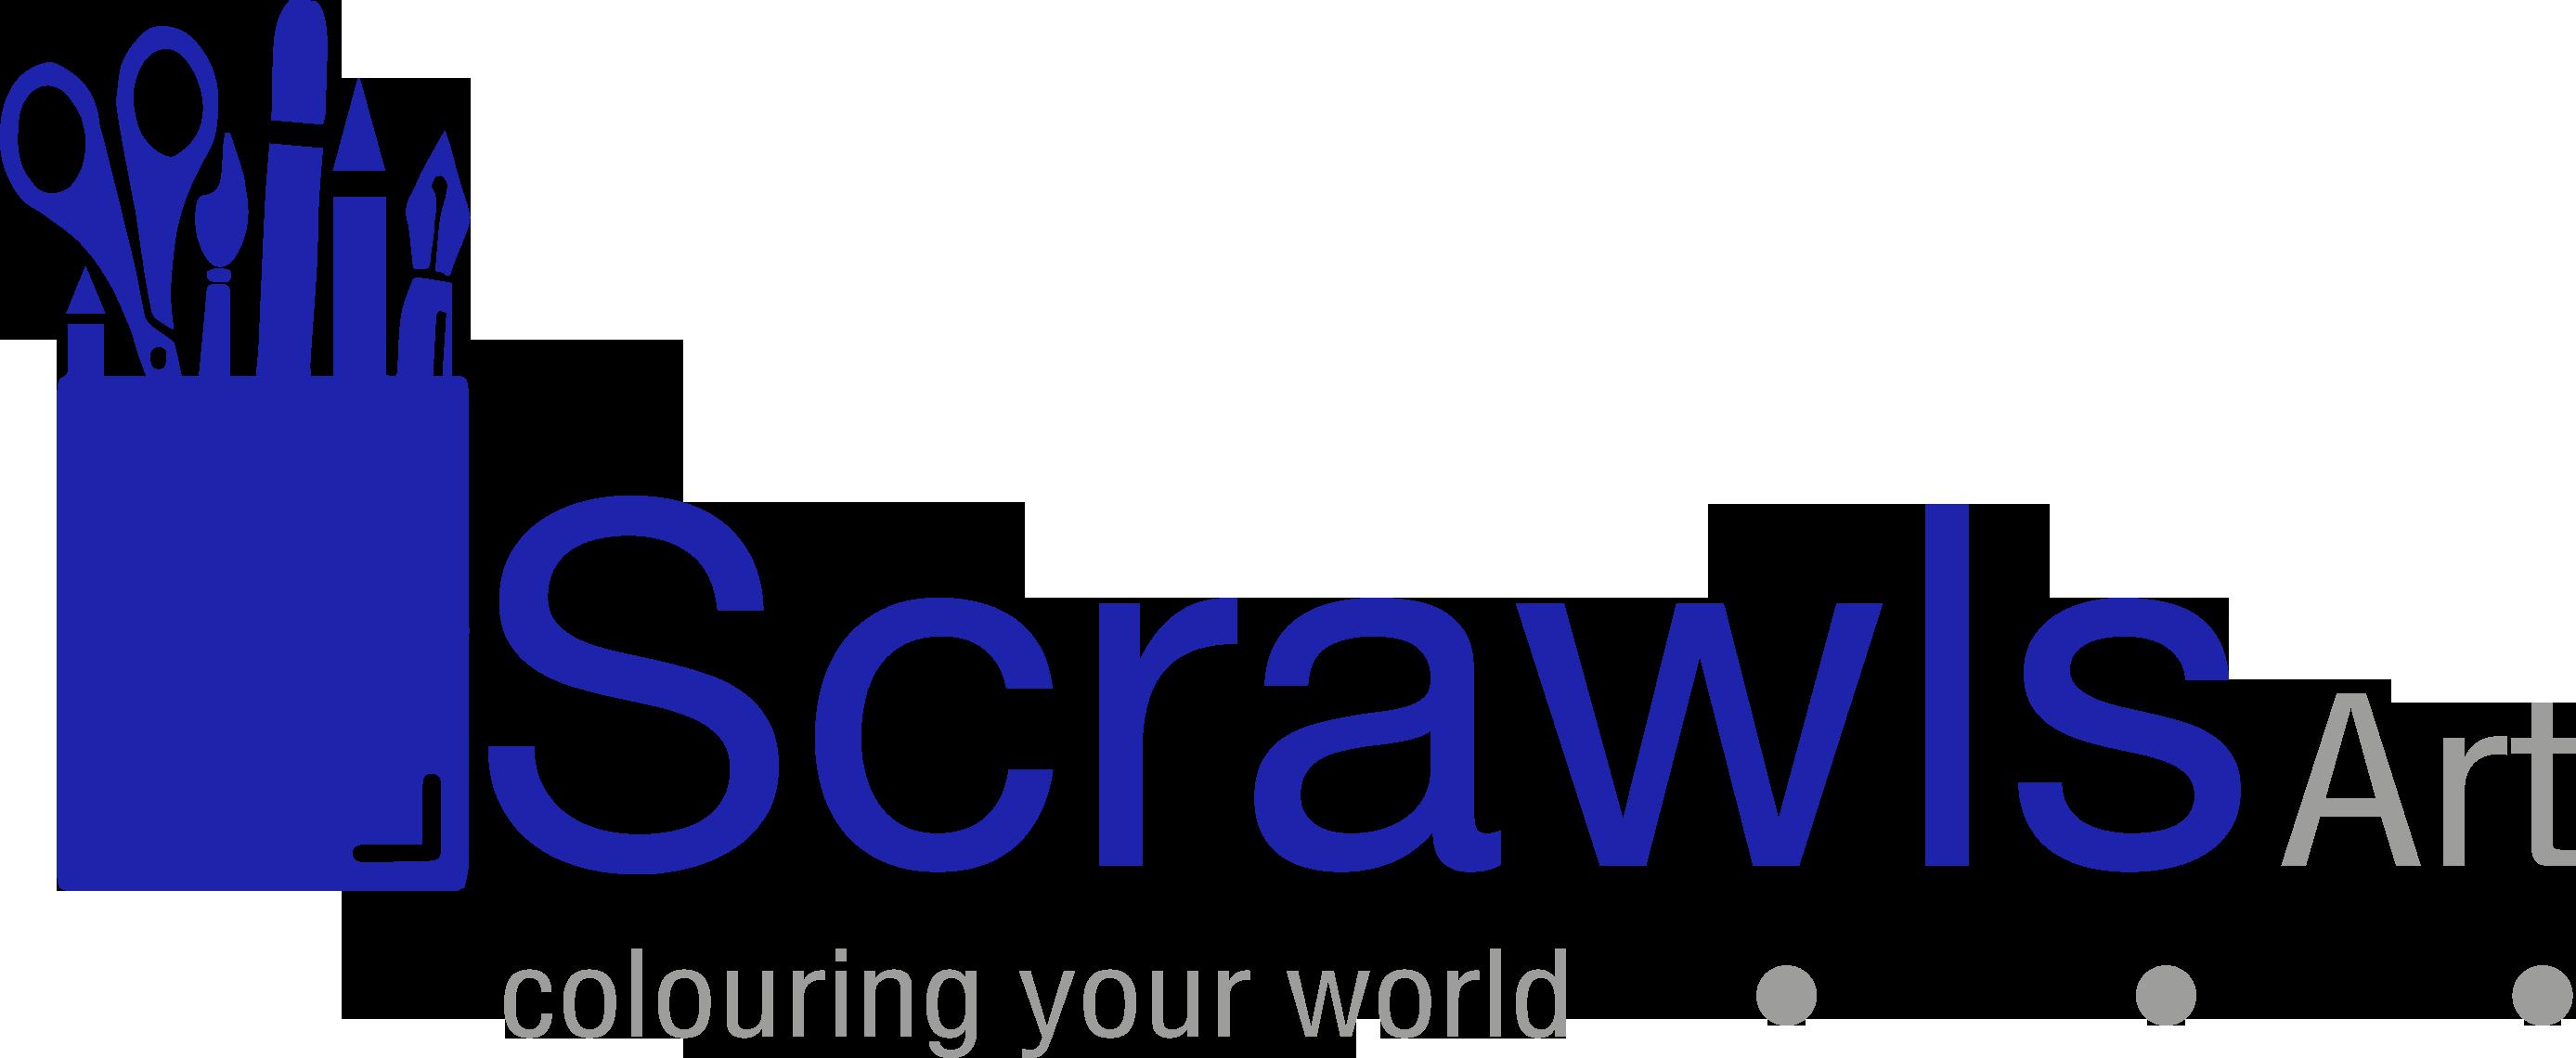 Logo Scrawls Art